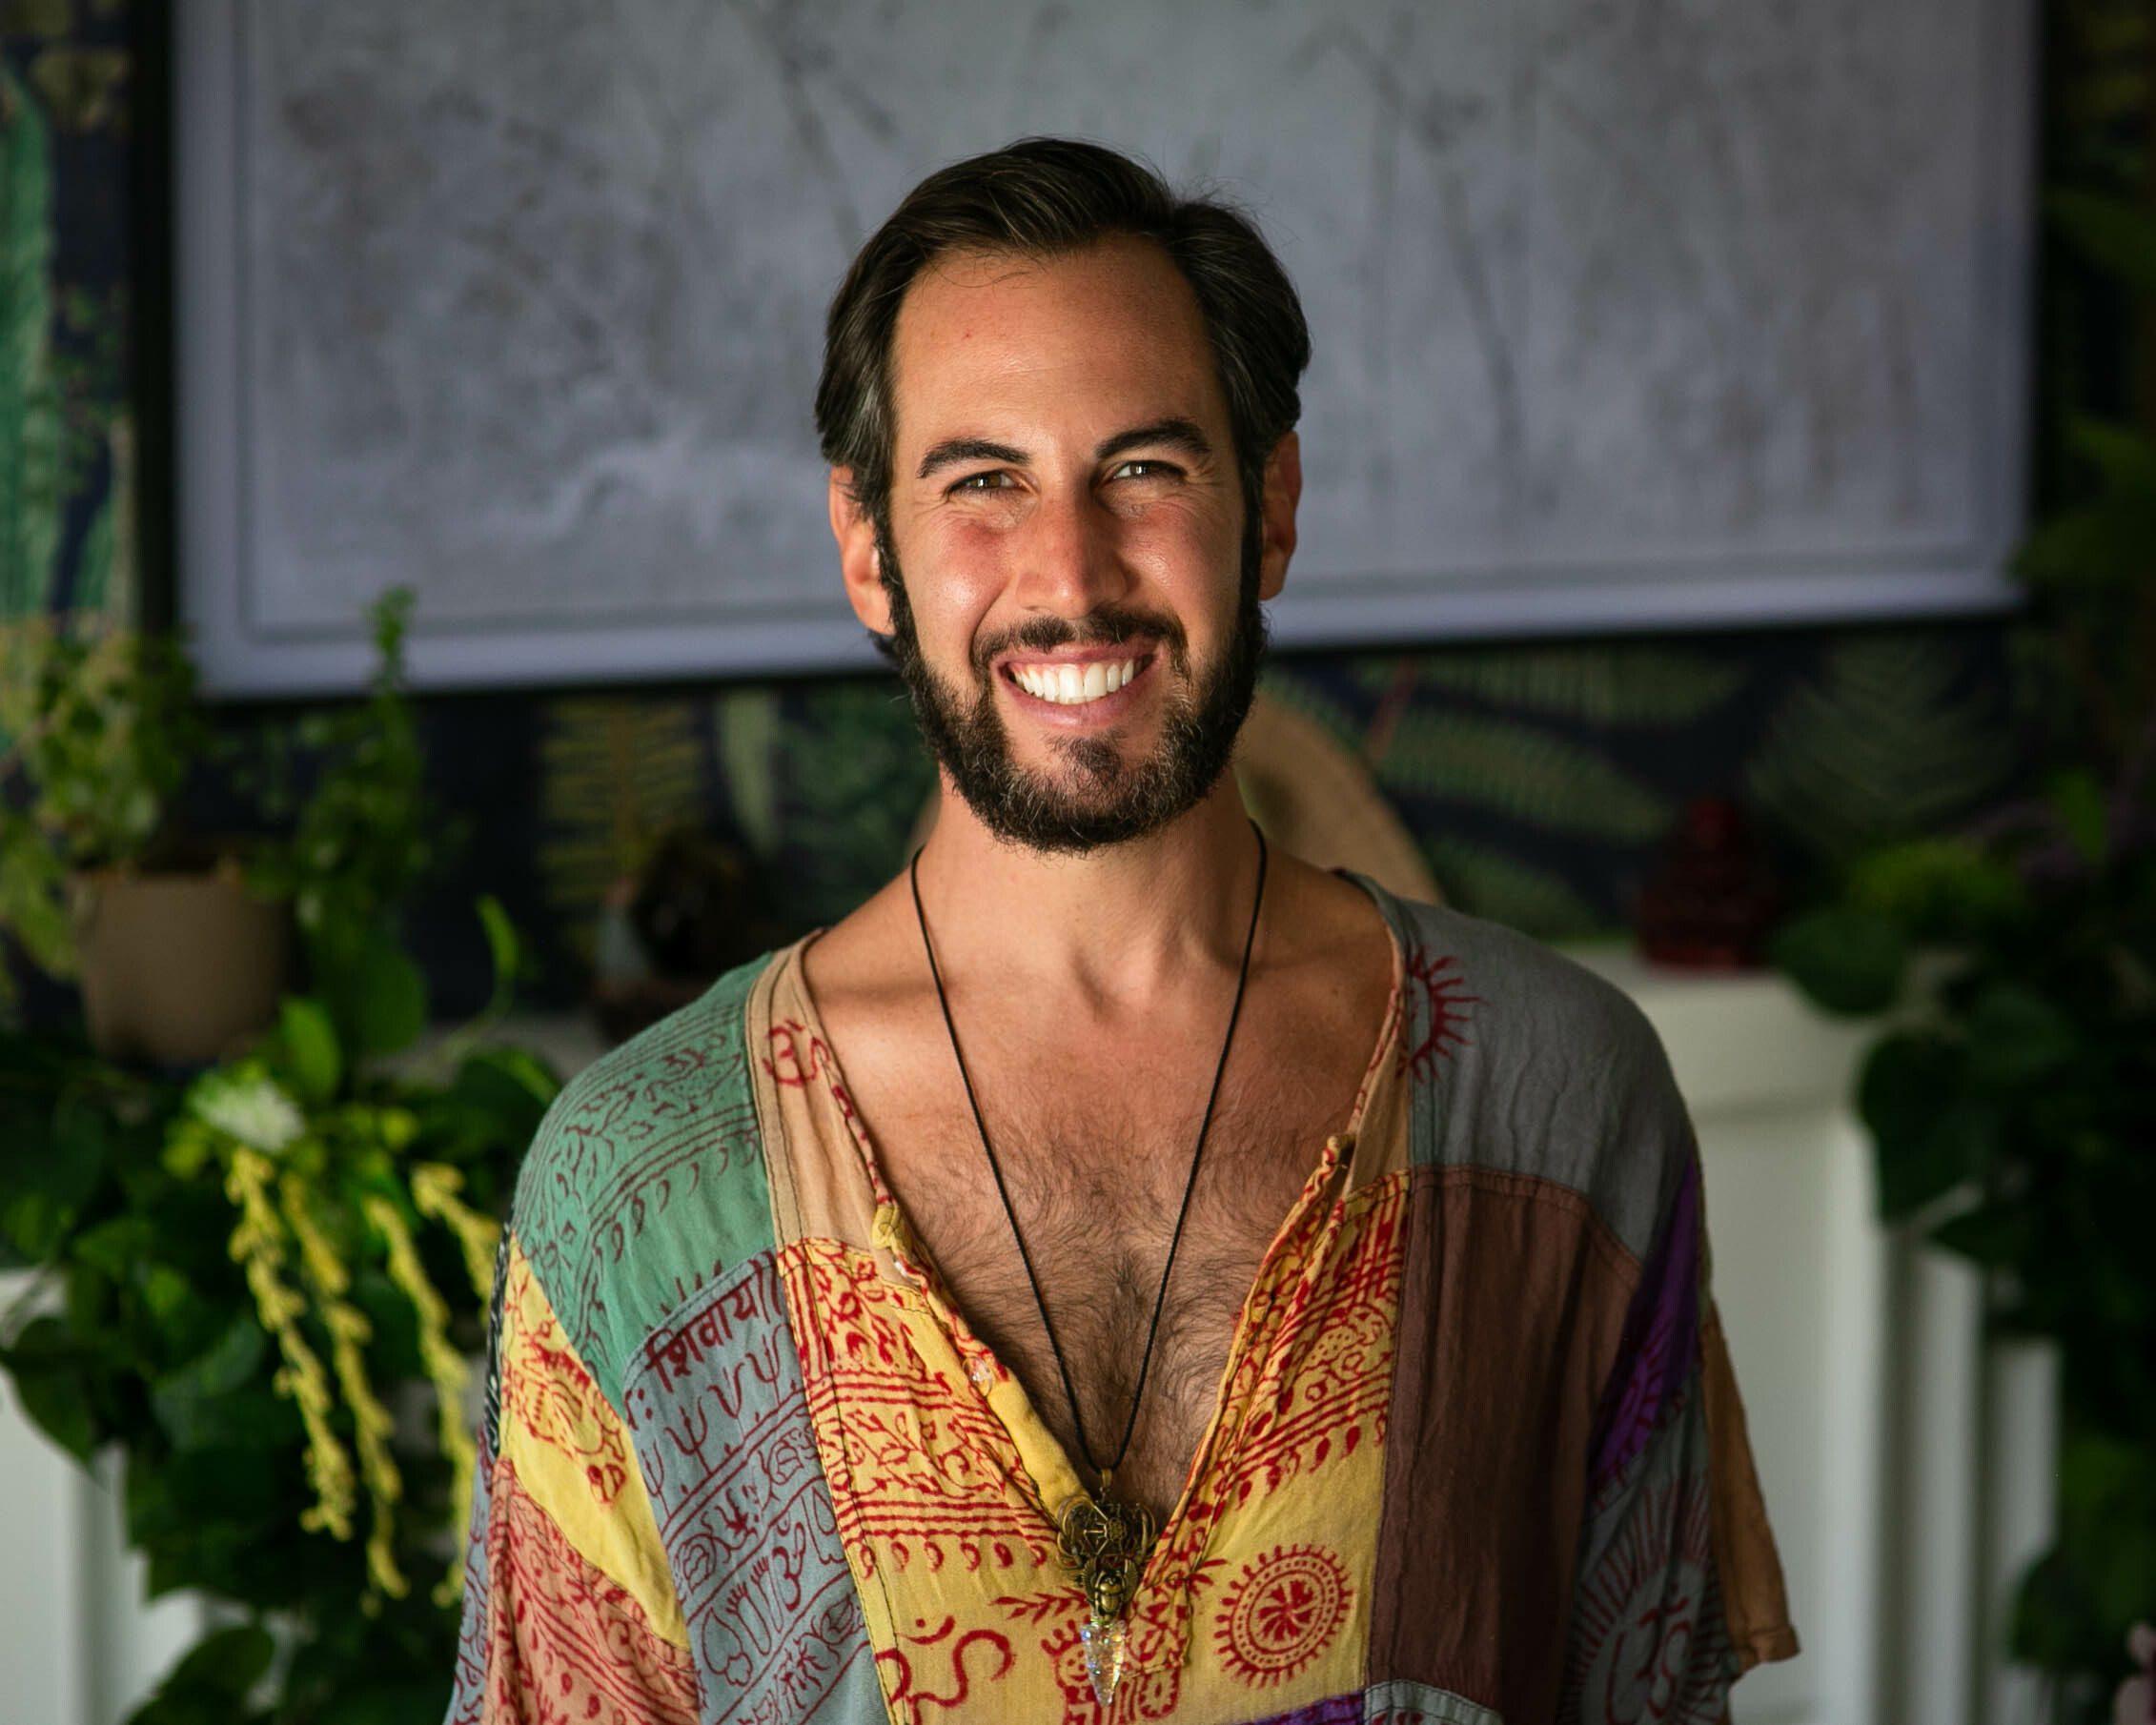 Tantra Yoga and Sensual Massage | Miami, New York, International | Justin